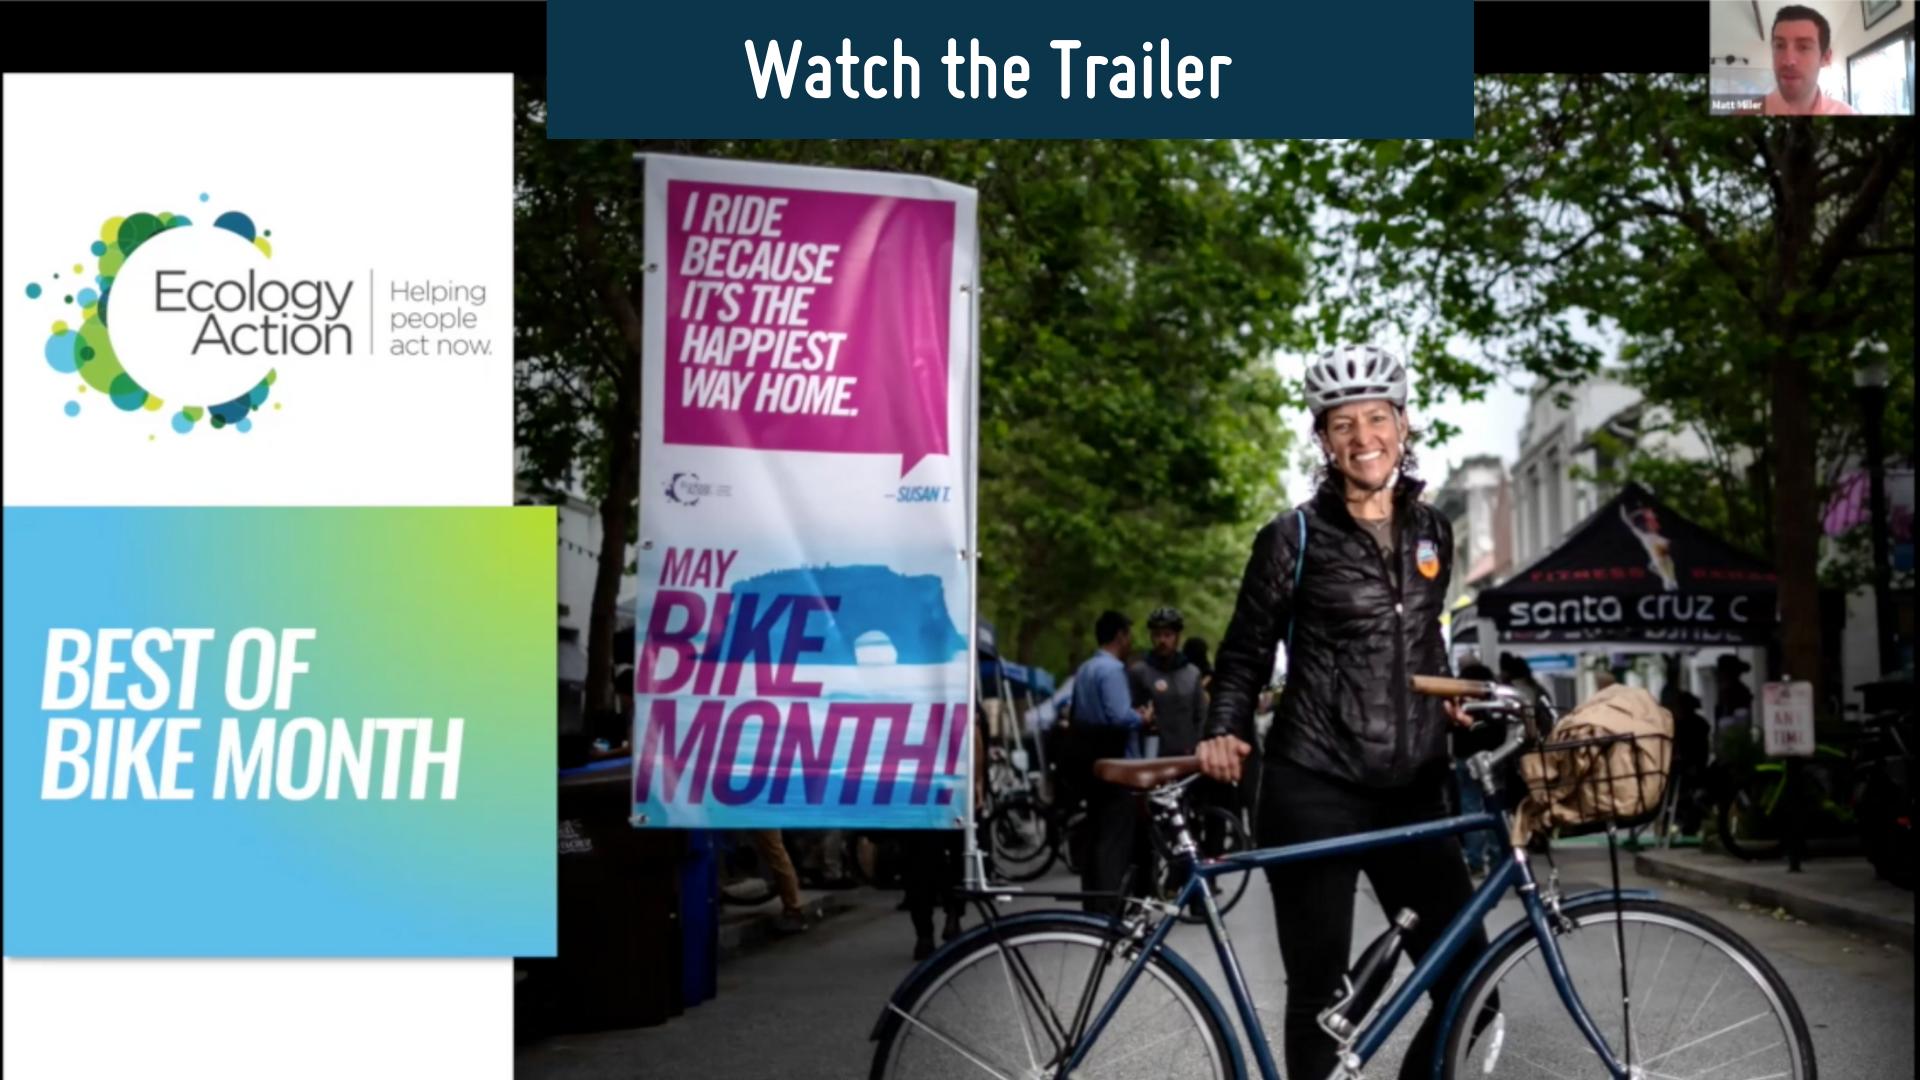 Bike Month Webinar Trailer